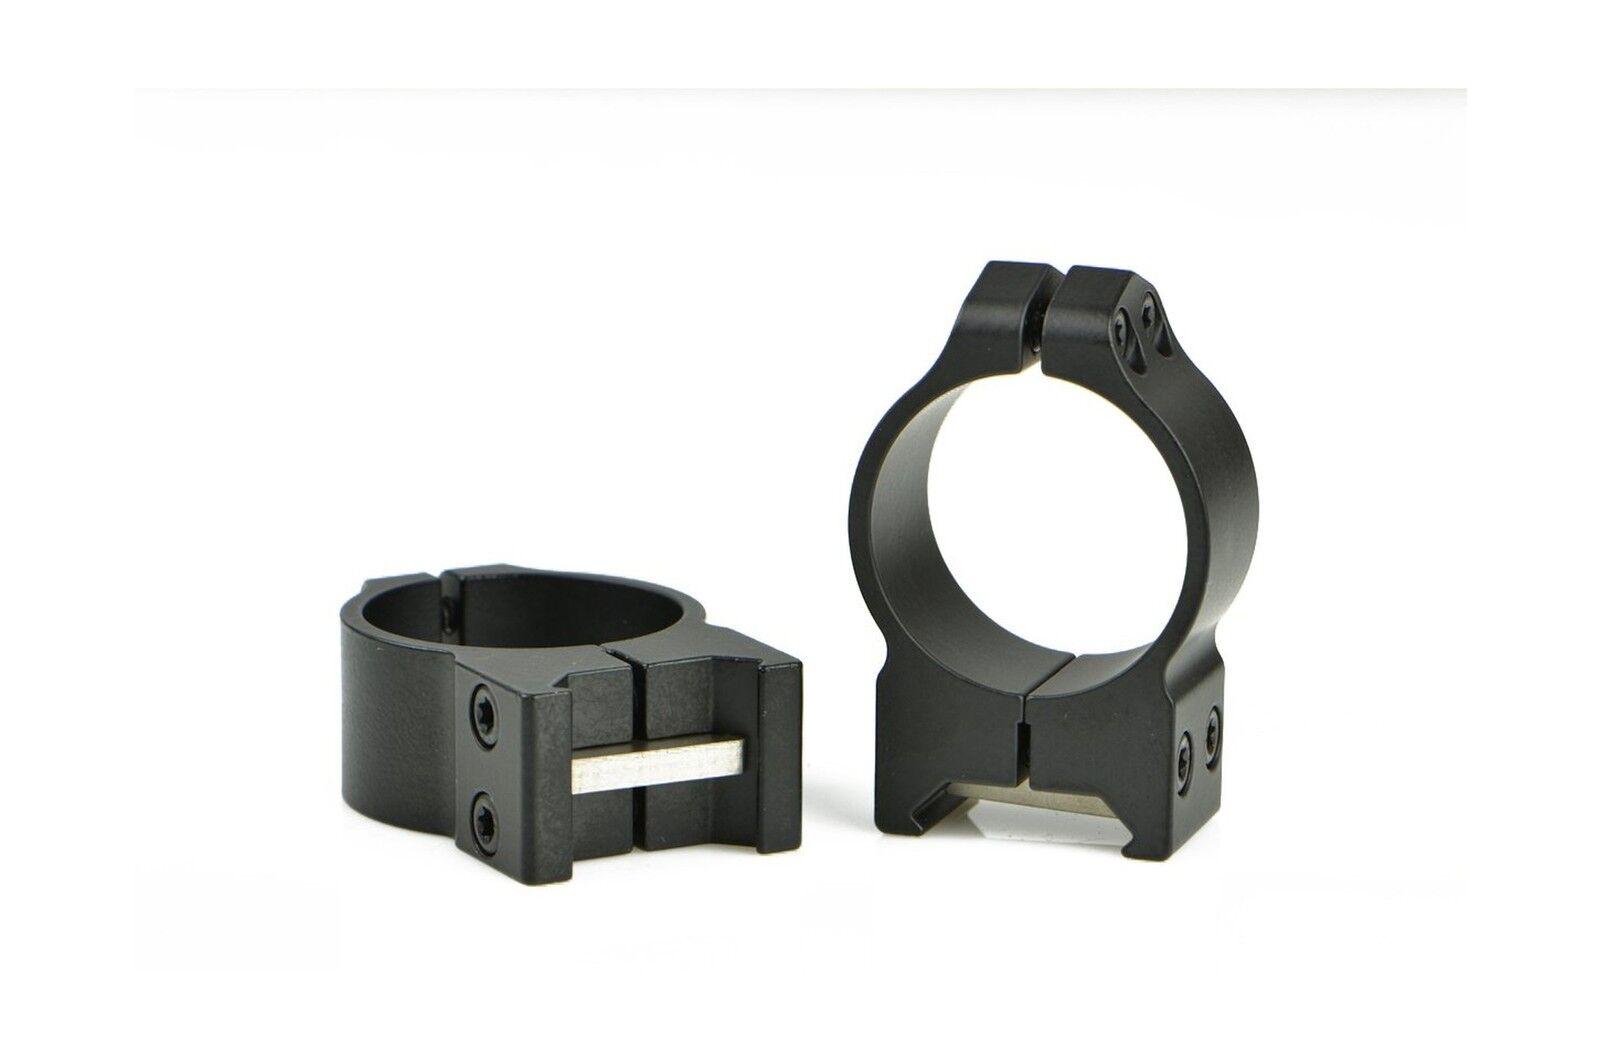 Warne Scope Mounts Medium Matte Permanent Attach Rings (30mm) Free Shipping